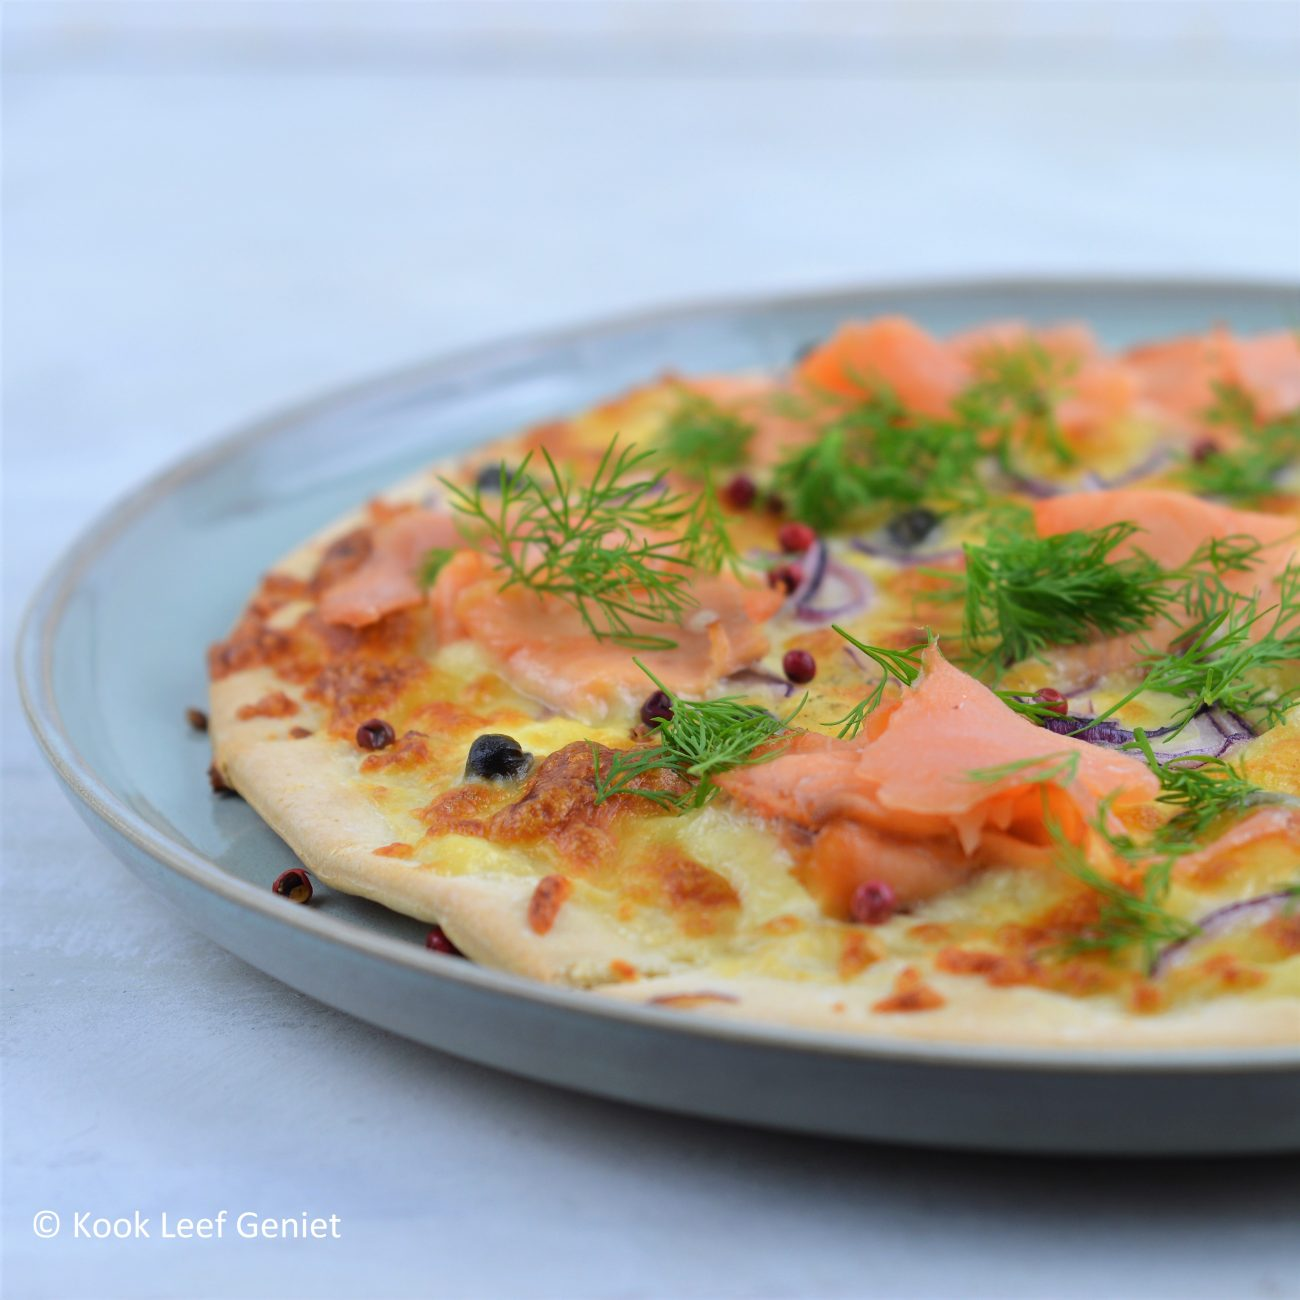 Witte pizza met gerookte zalm en dille